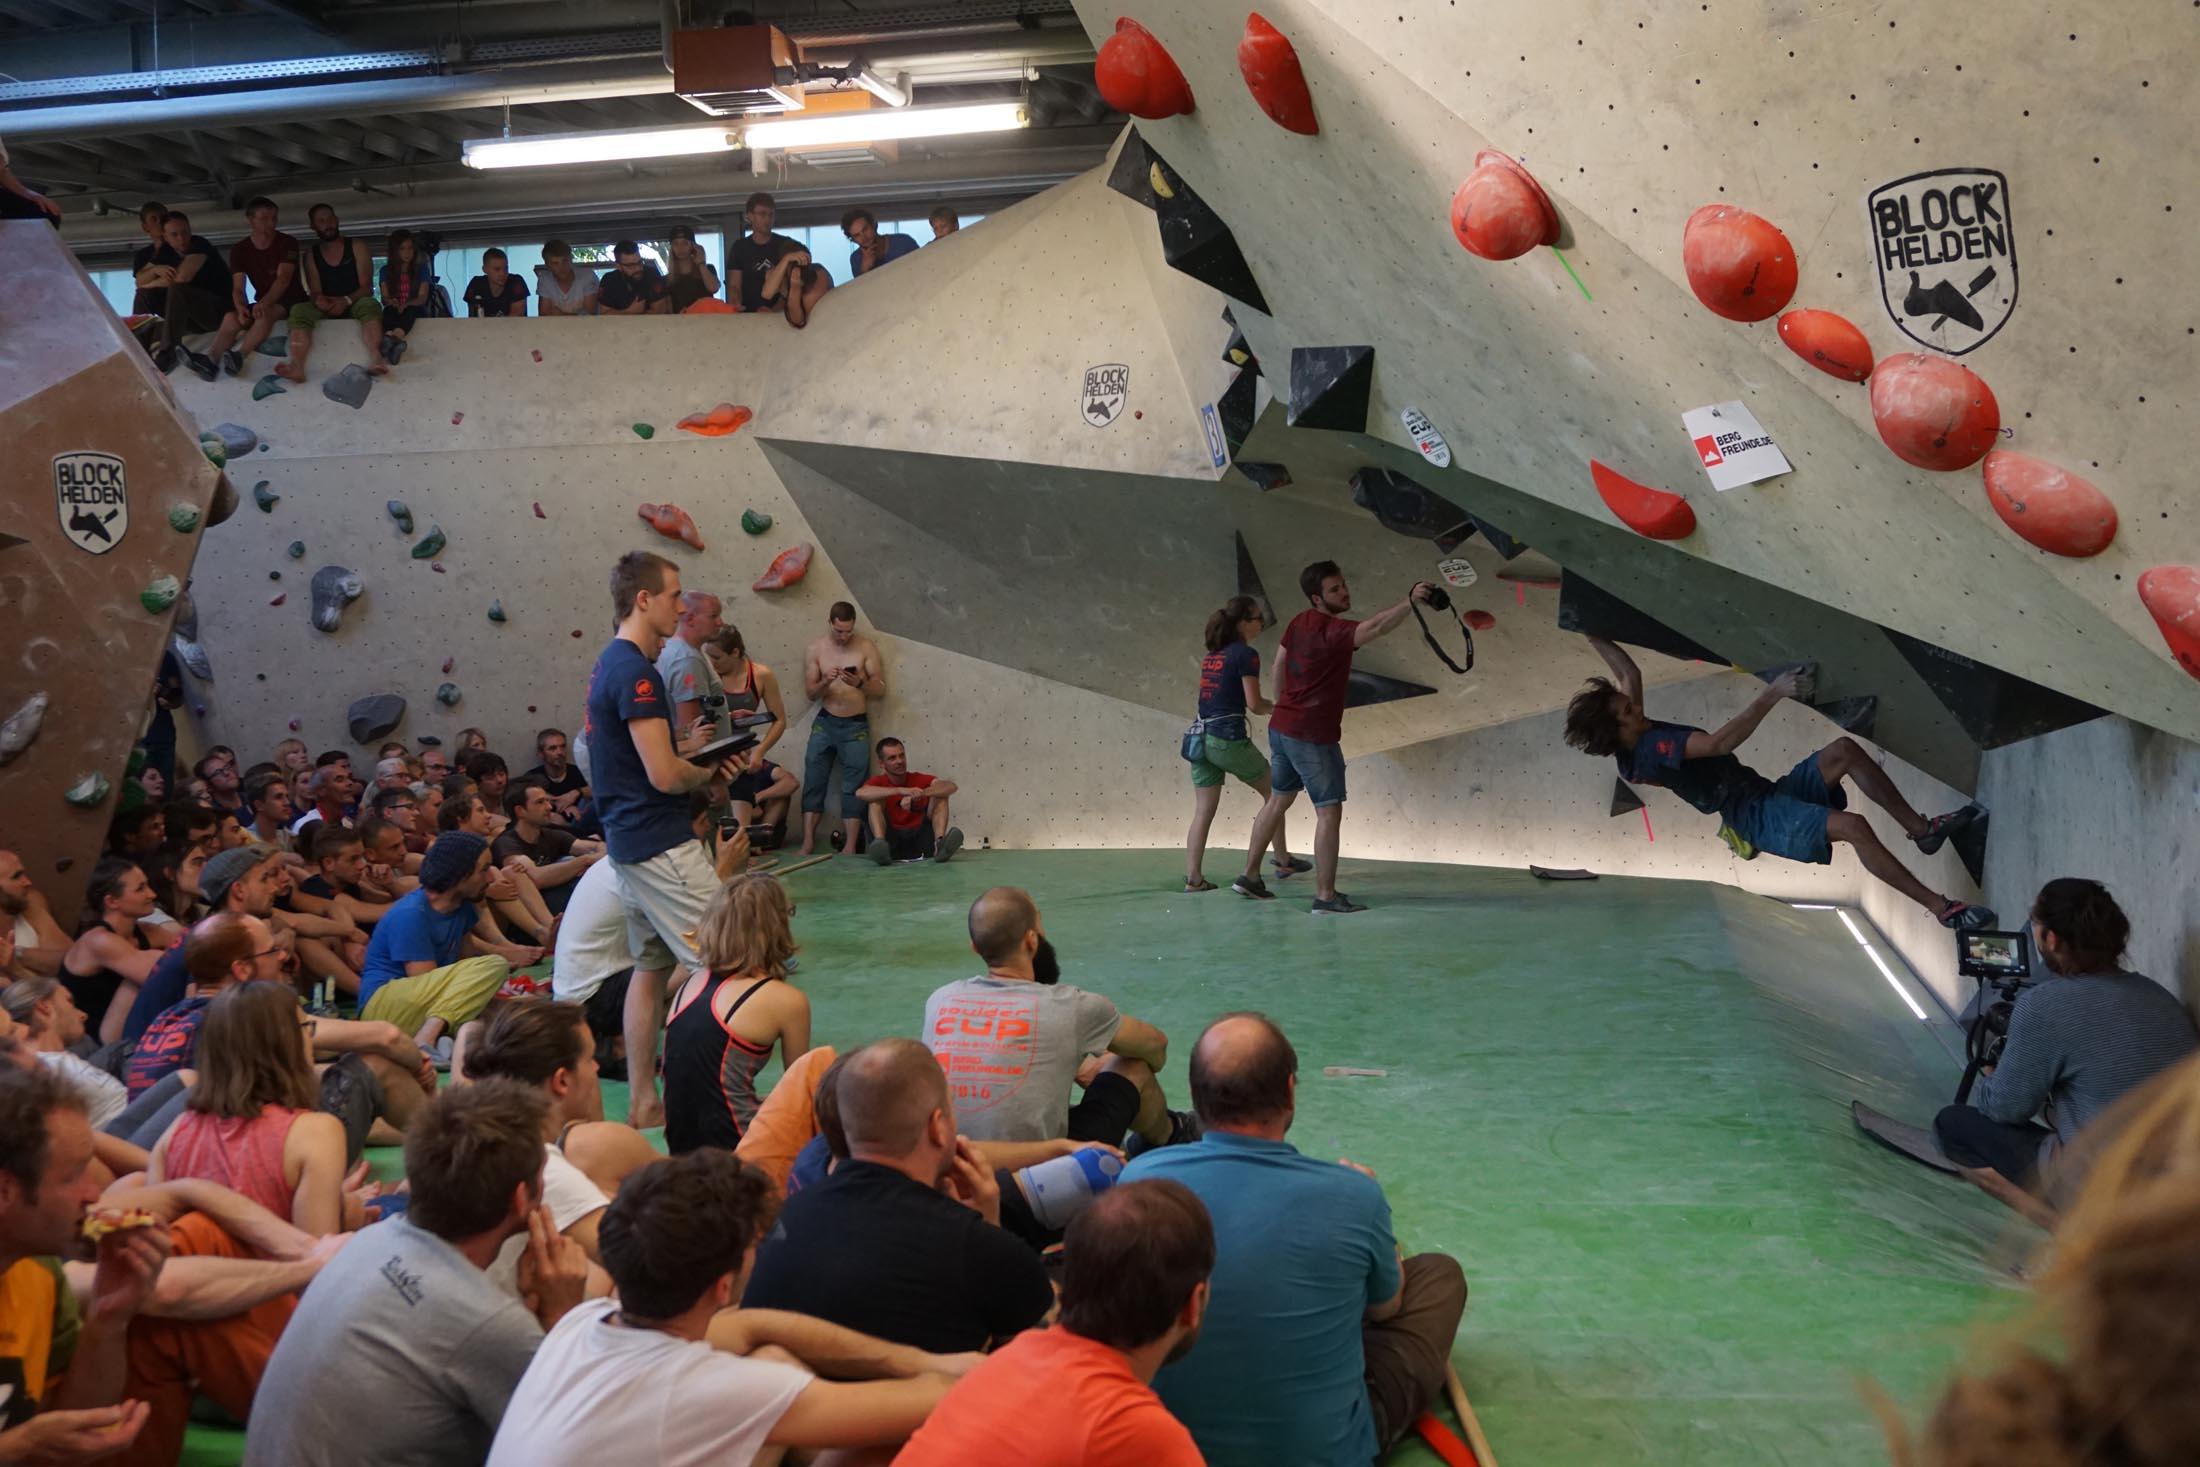 Finale, internationaler bouldercup Frankenjura 2016, BLOCKHELDEN Erlangen, Mammut, Bergfreunde.de, Boulderwettkampf07092016683